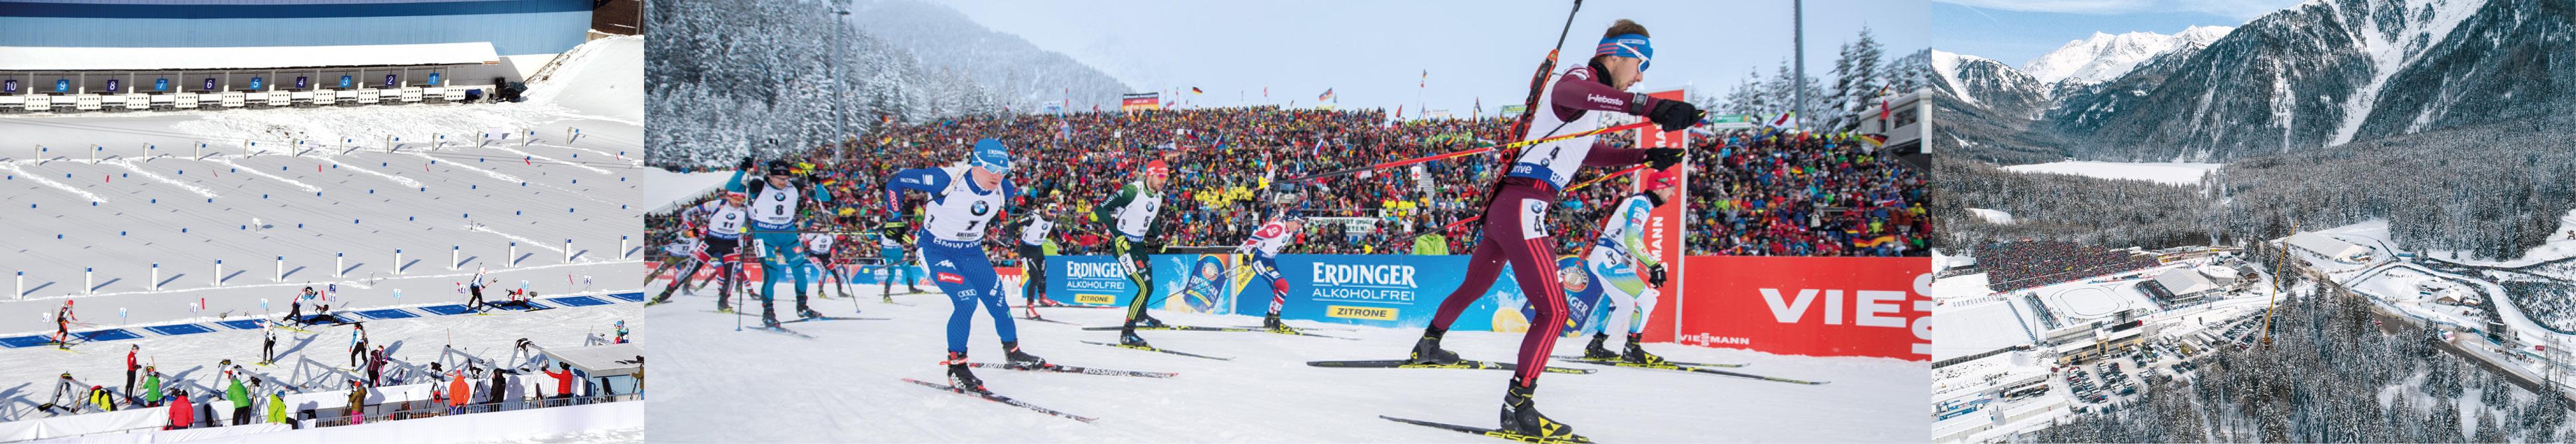 Slider Biathlon Antholz